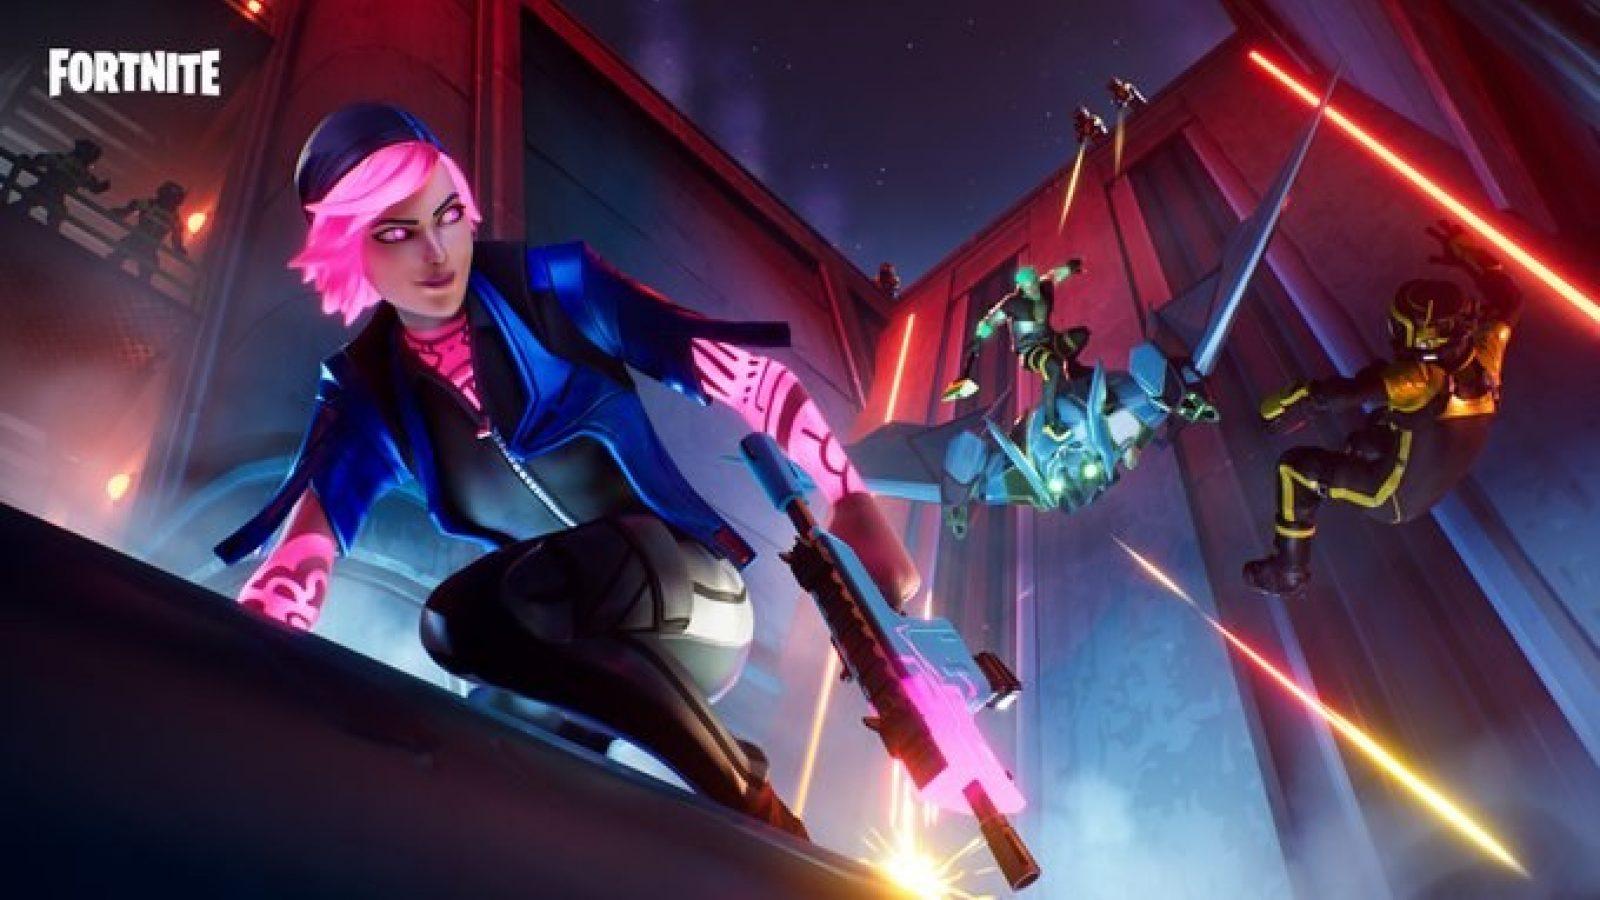 Screens To Dance Fortnite Upcoming Fortnite Mode Teased Through In Game Load Screens Fortnite Fyi